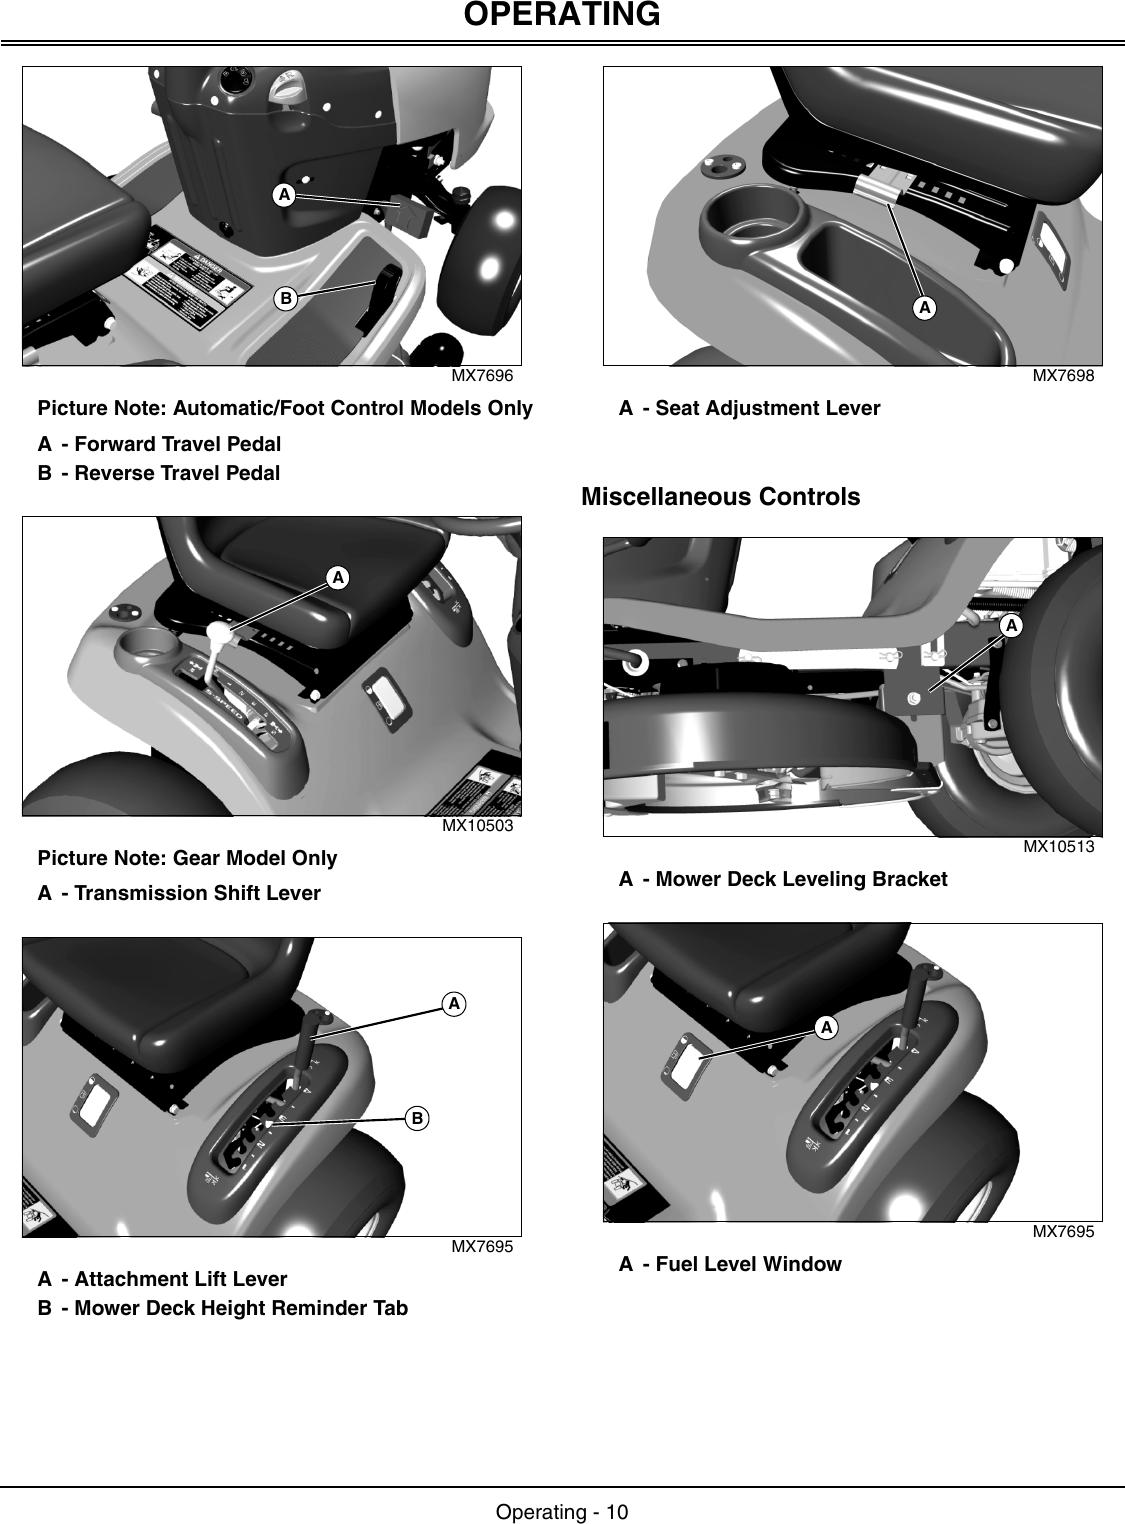 John Deere L1742 Users Manual